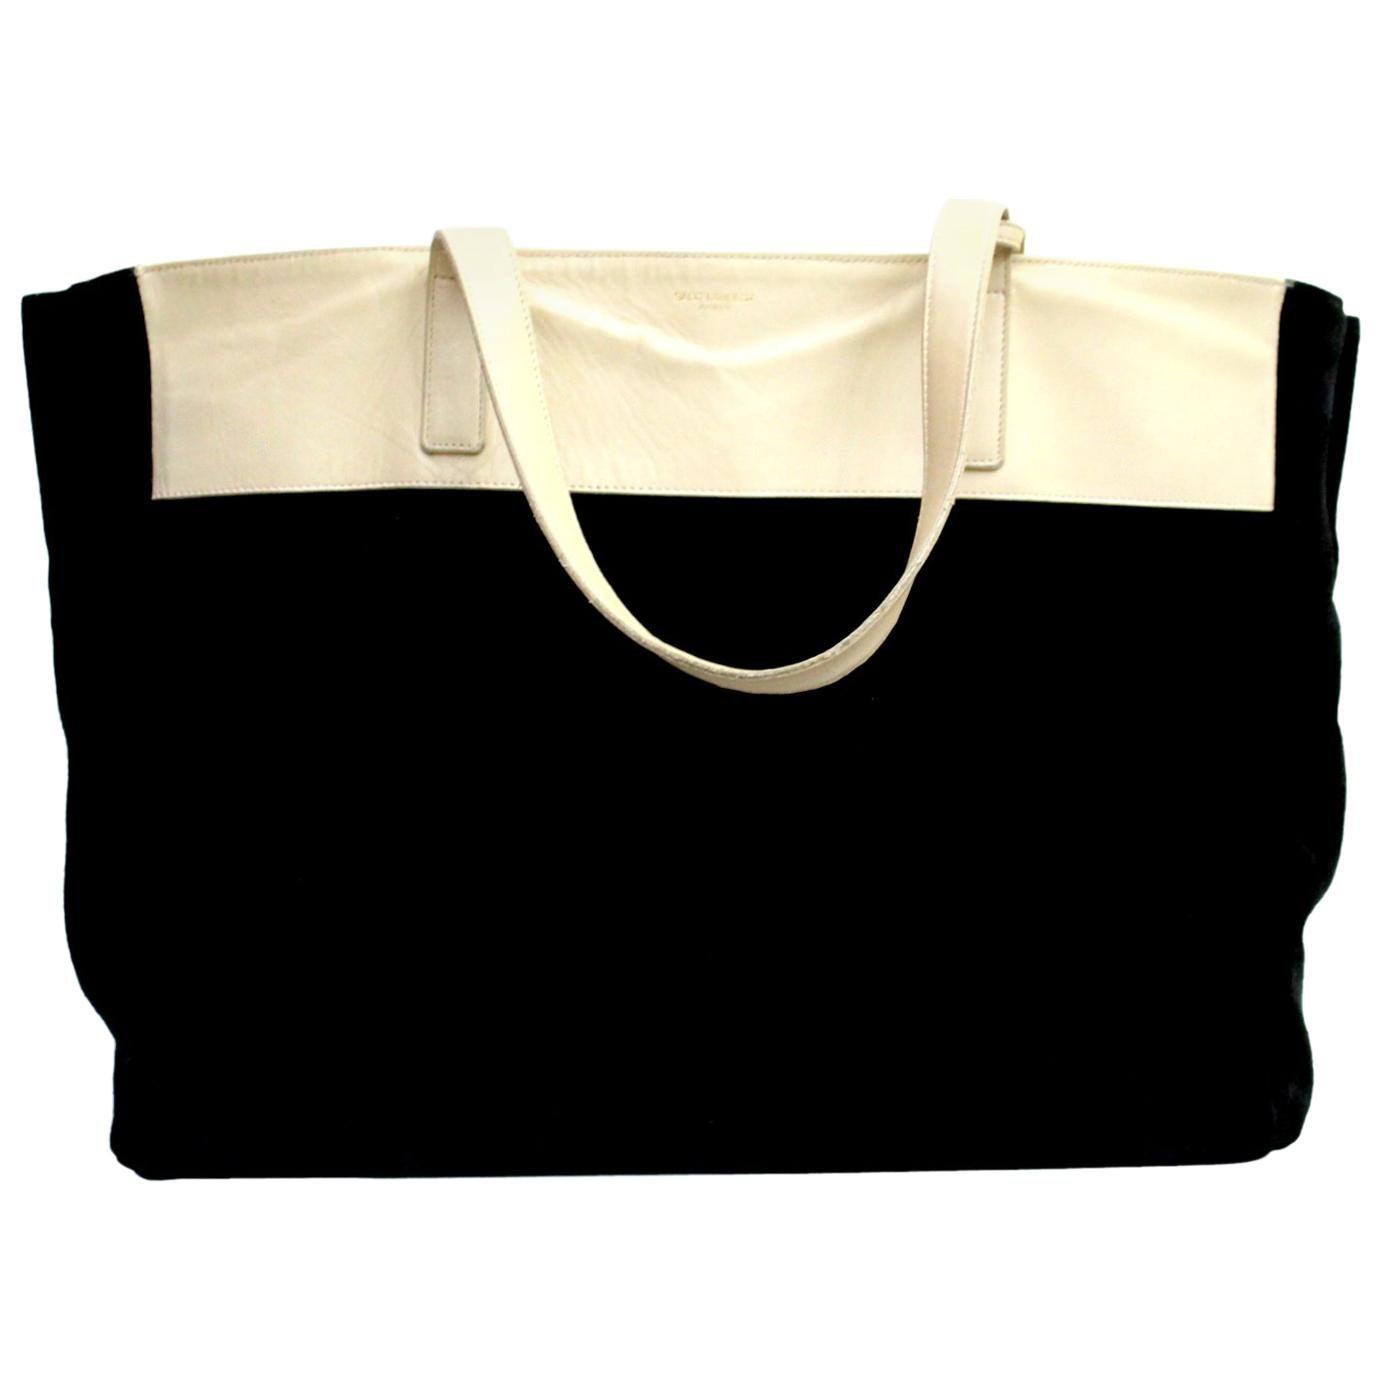 Saint Laurent Black and Beige Shopping Bag